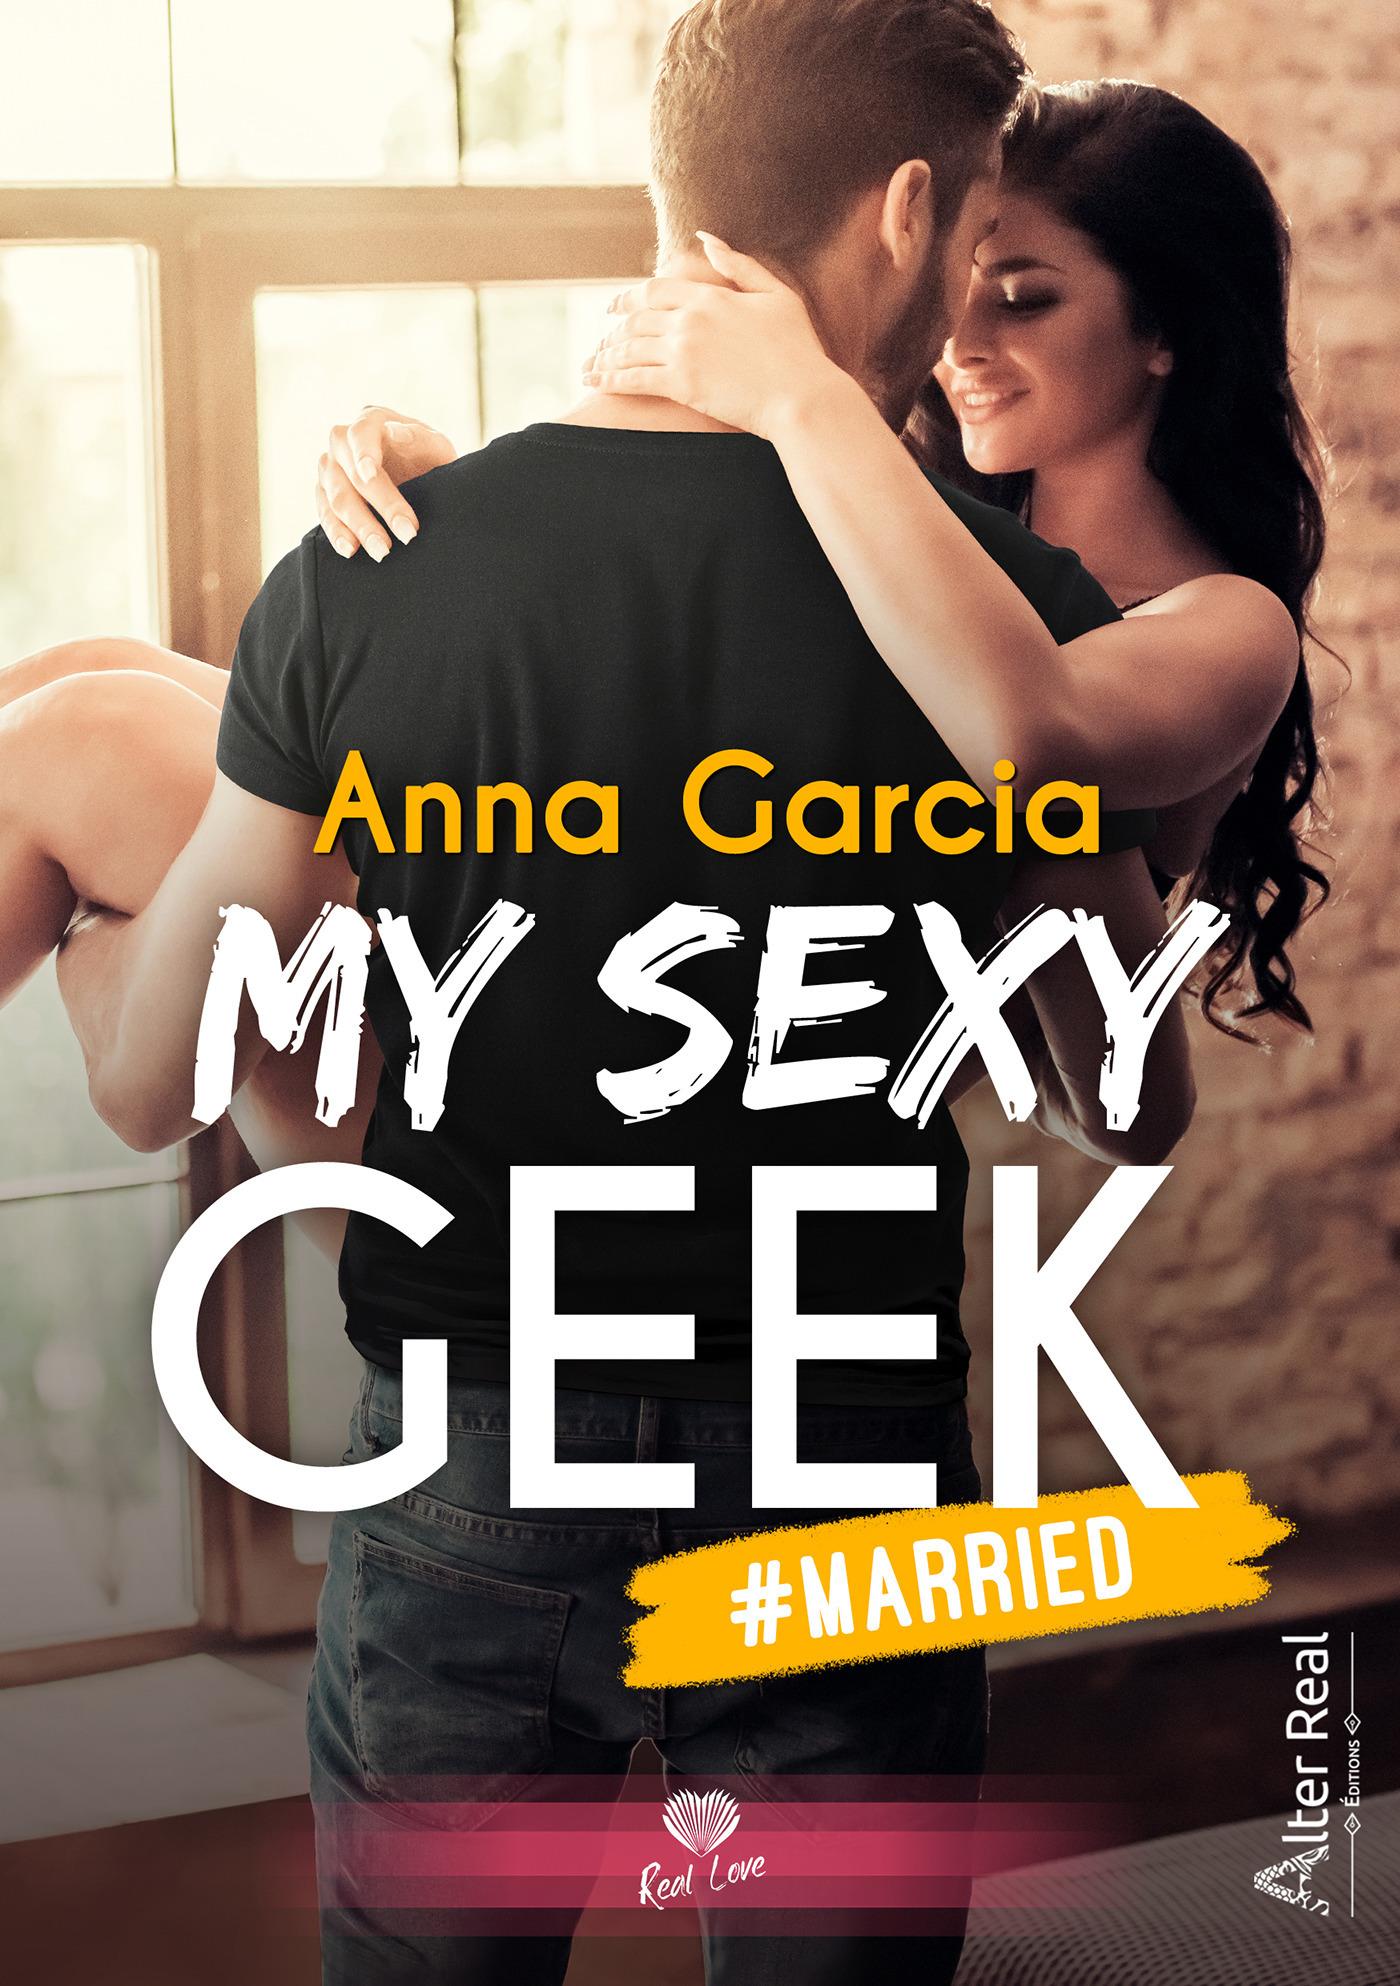 #Married  - Anna Garcia